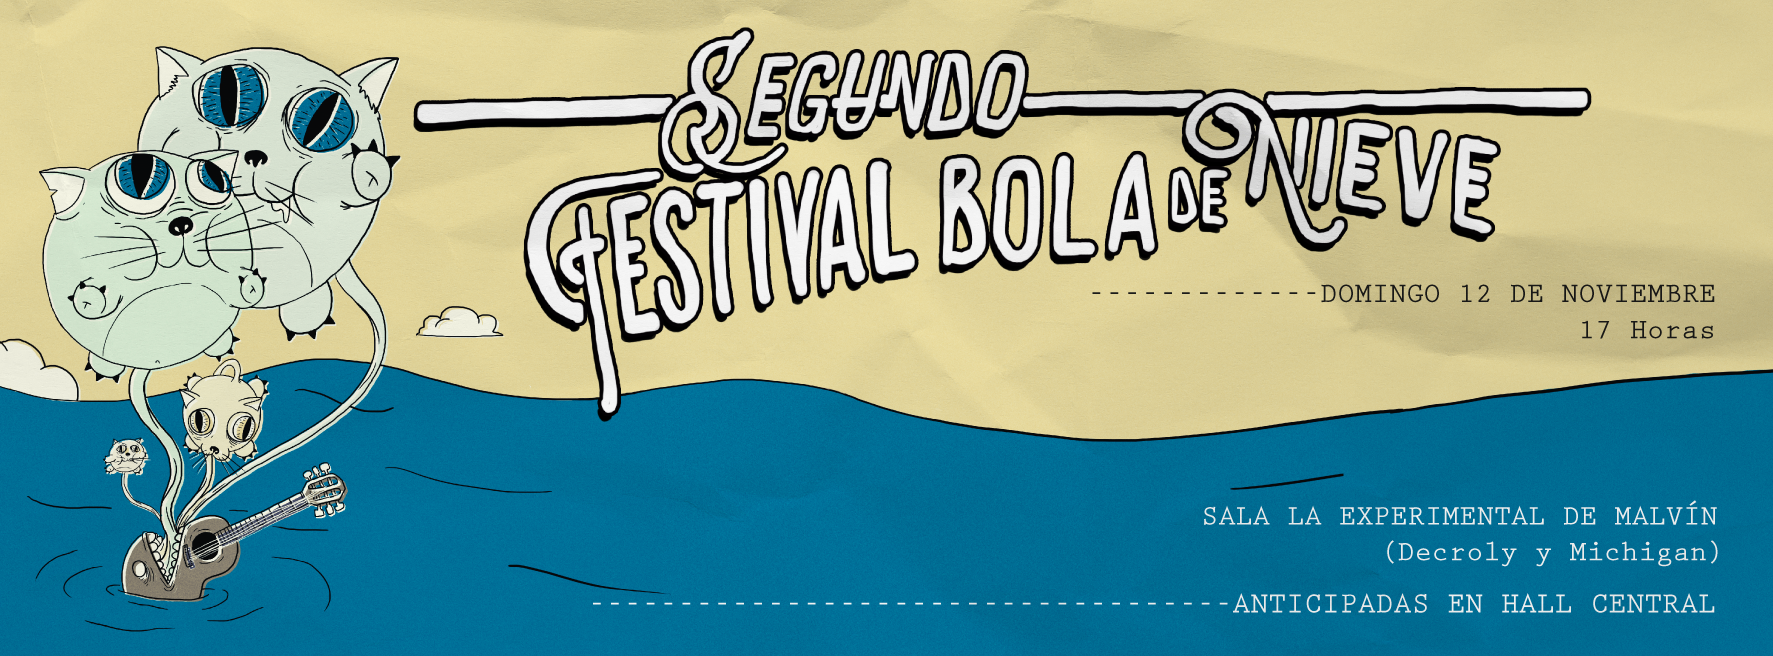 festivalboladenieve.png